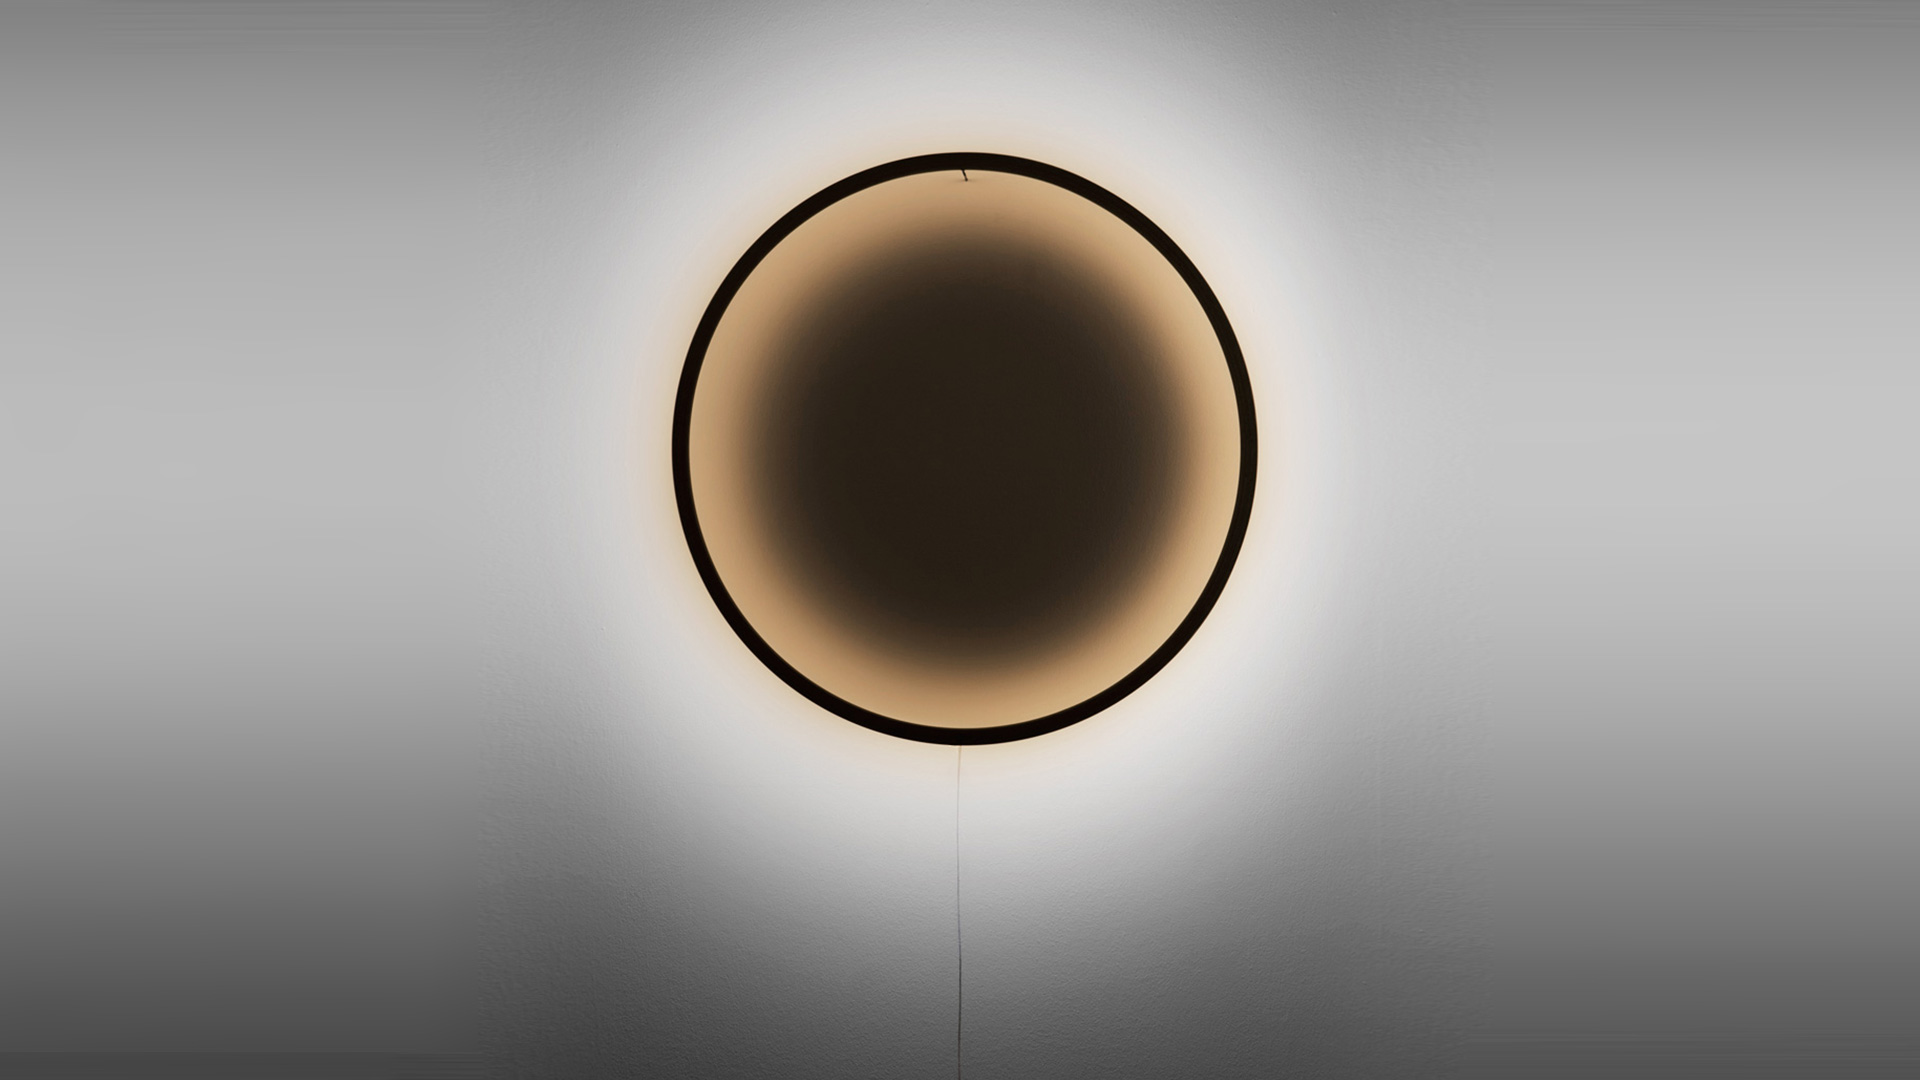 ECLIPSE LAMP by TILEN SEPIC